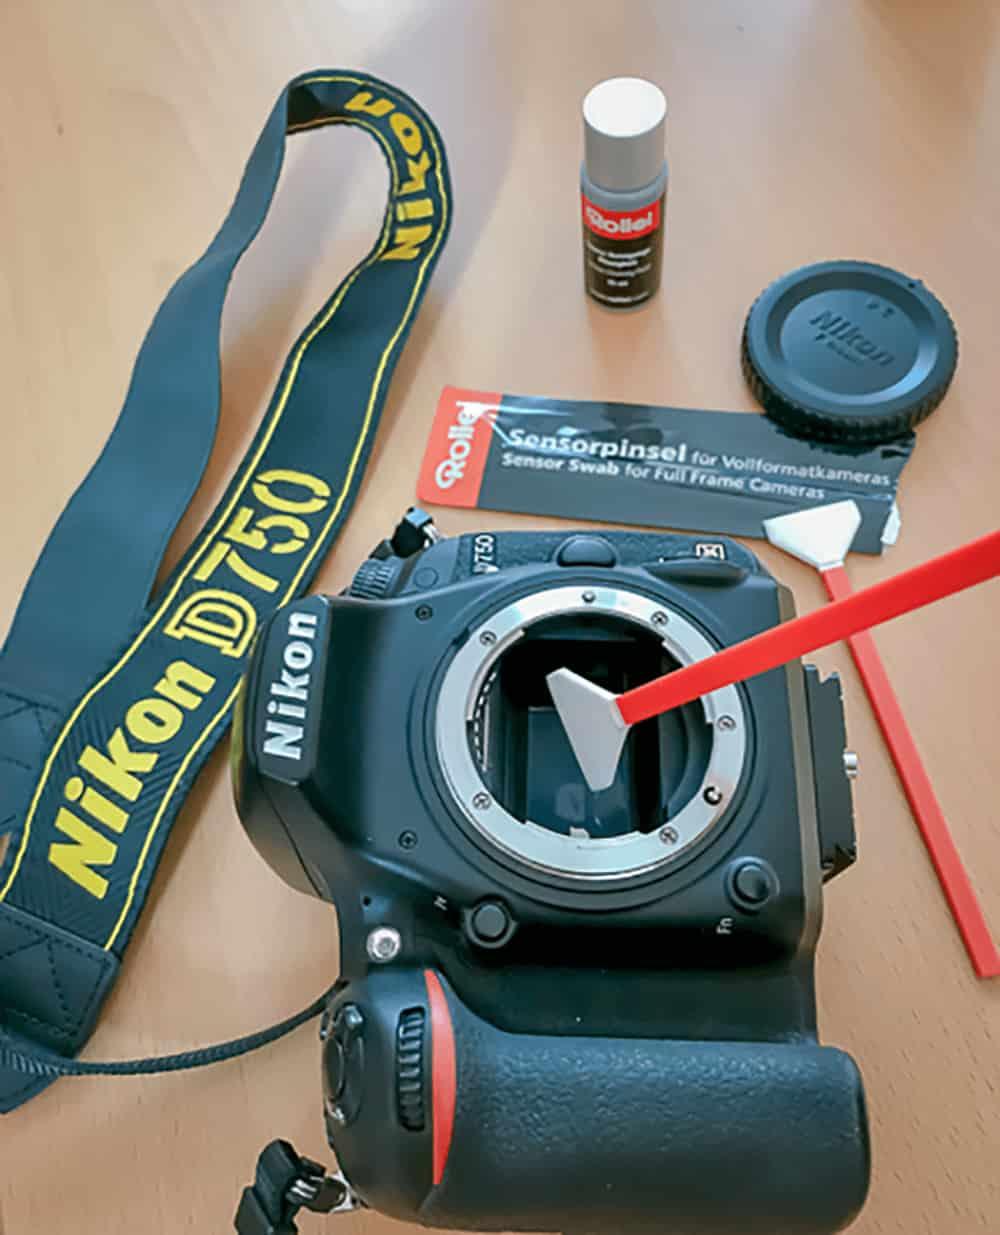 Sensorreinigung der Kamera. Flugzeuge fotogriafieren